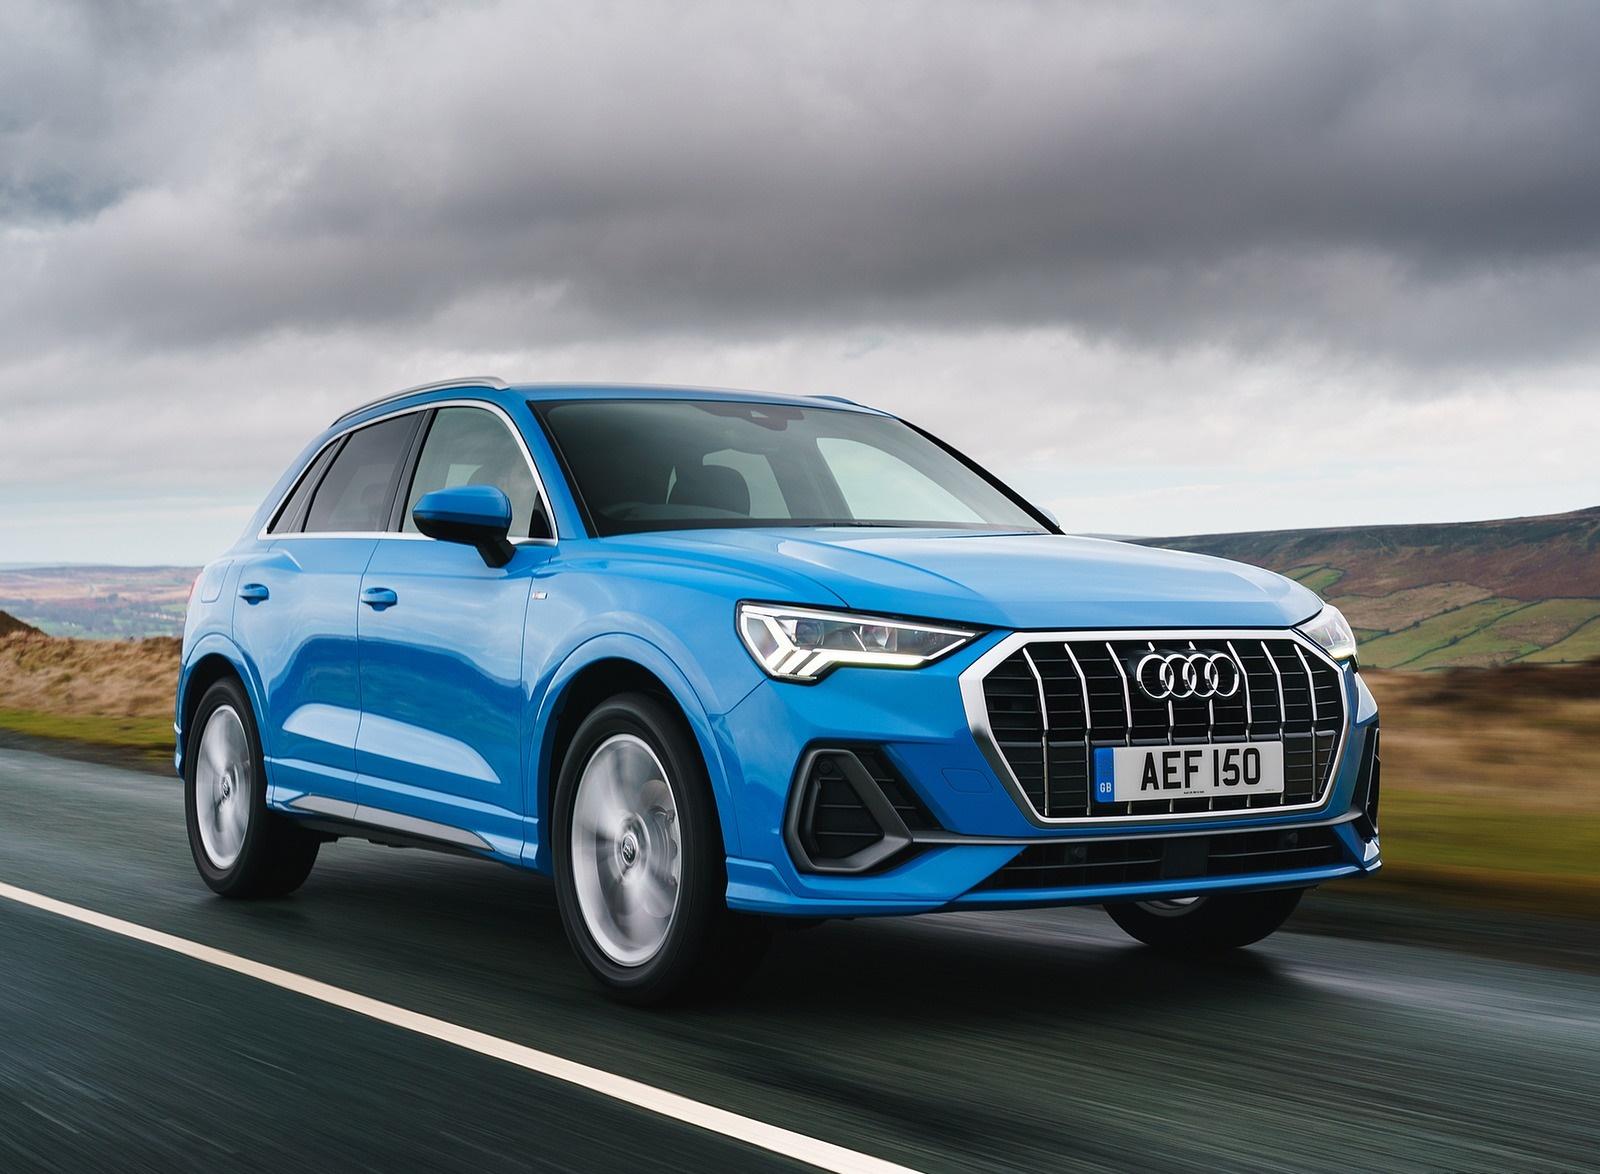 2019 Audi Q3 35 TFSI (UK-Spec) Front Three-Quarter Wallpaper (1)